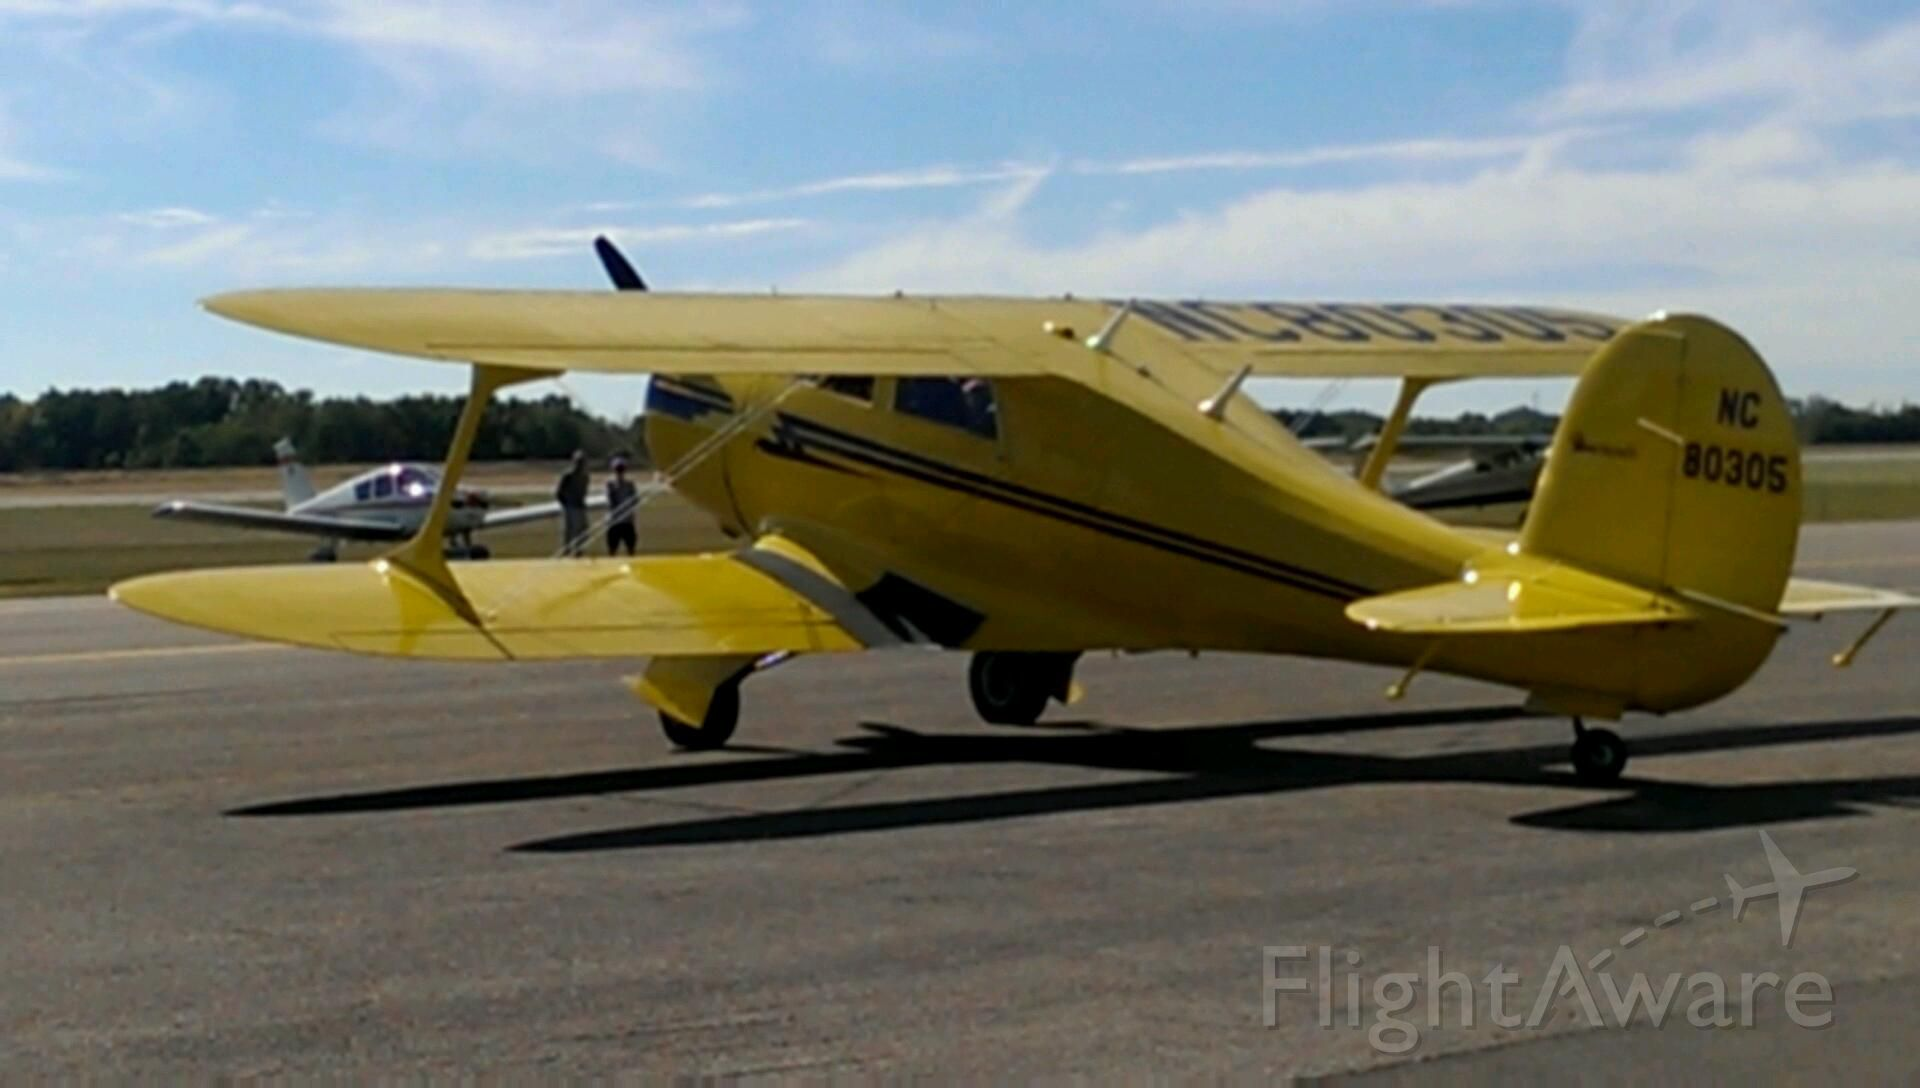 — — - Beechcraft Staggerwing, original home: John Wayne Airport, now: Ohio